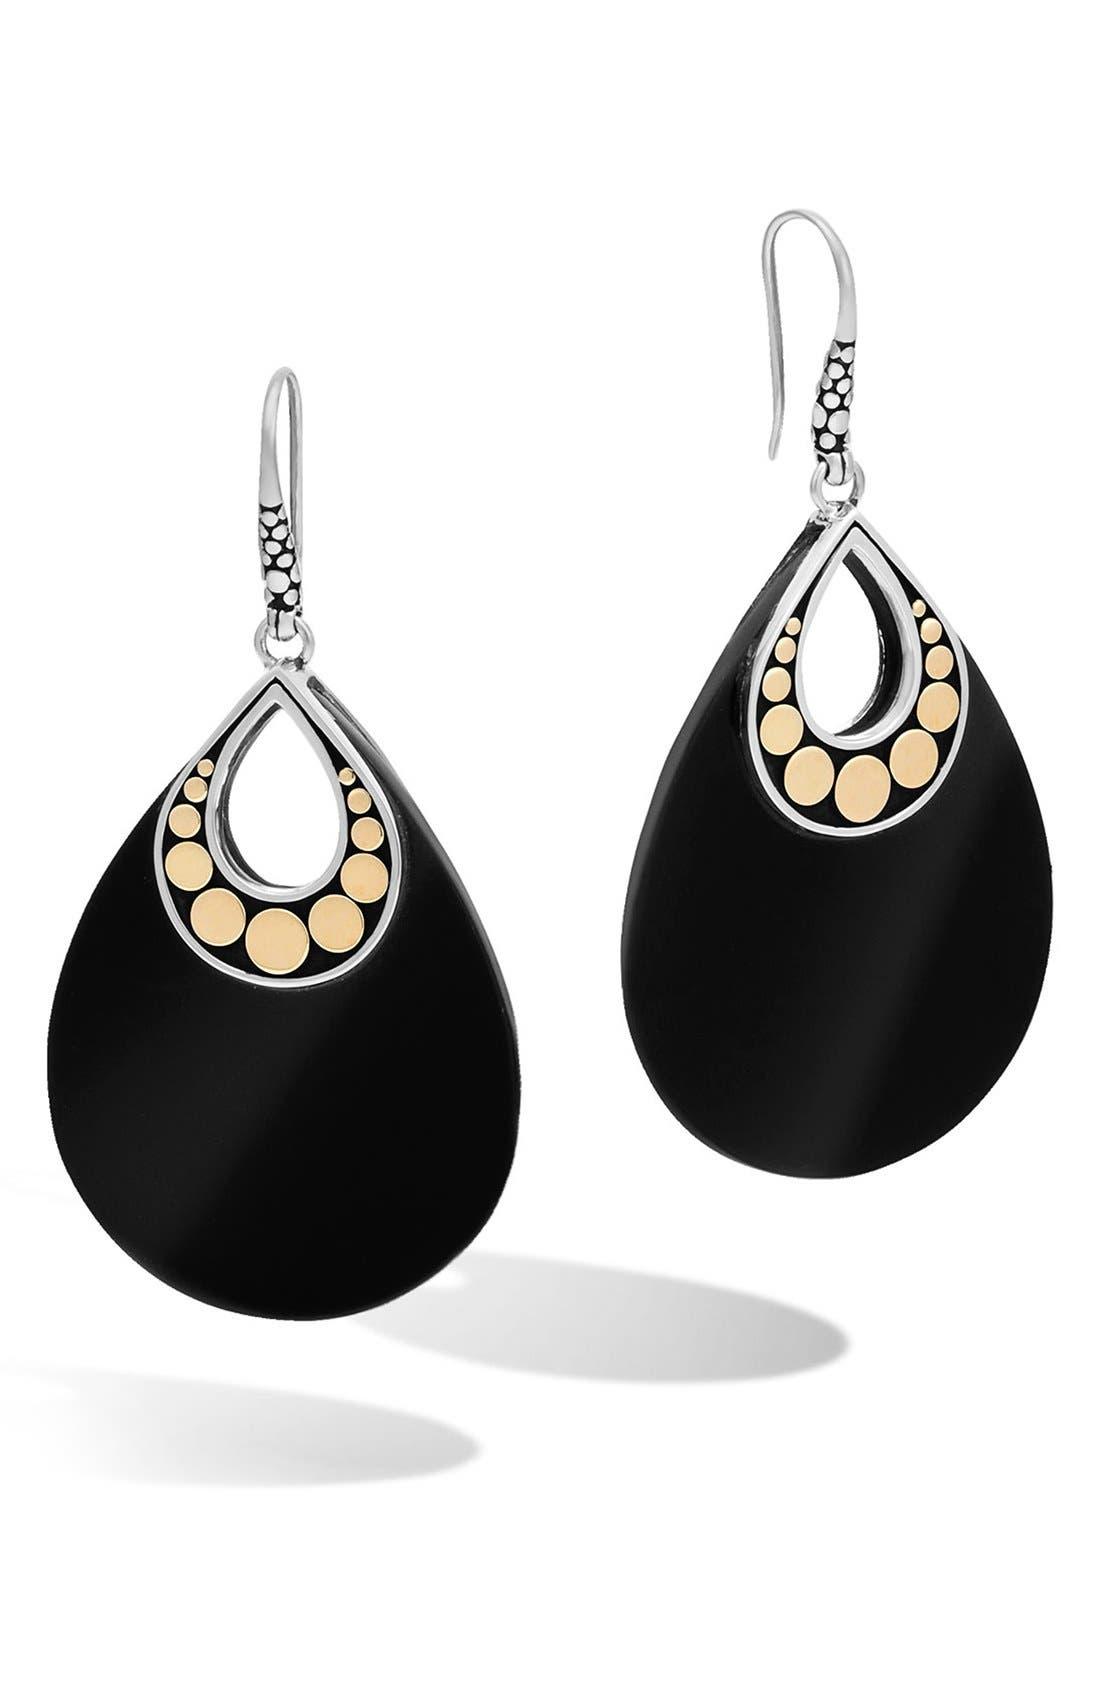 'Dot' Drop Earrings,                         Main,                         color, Silver/ Black Chalcedony